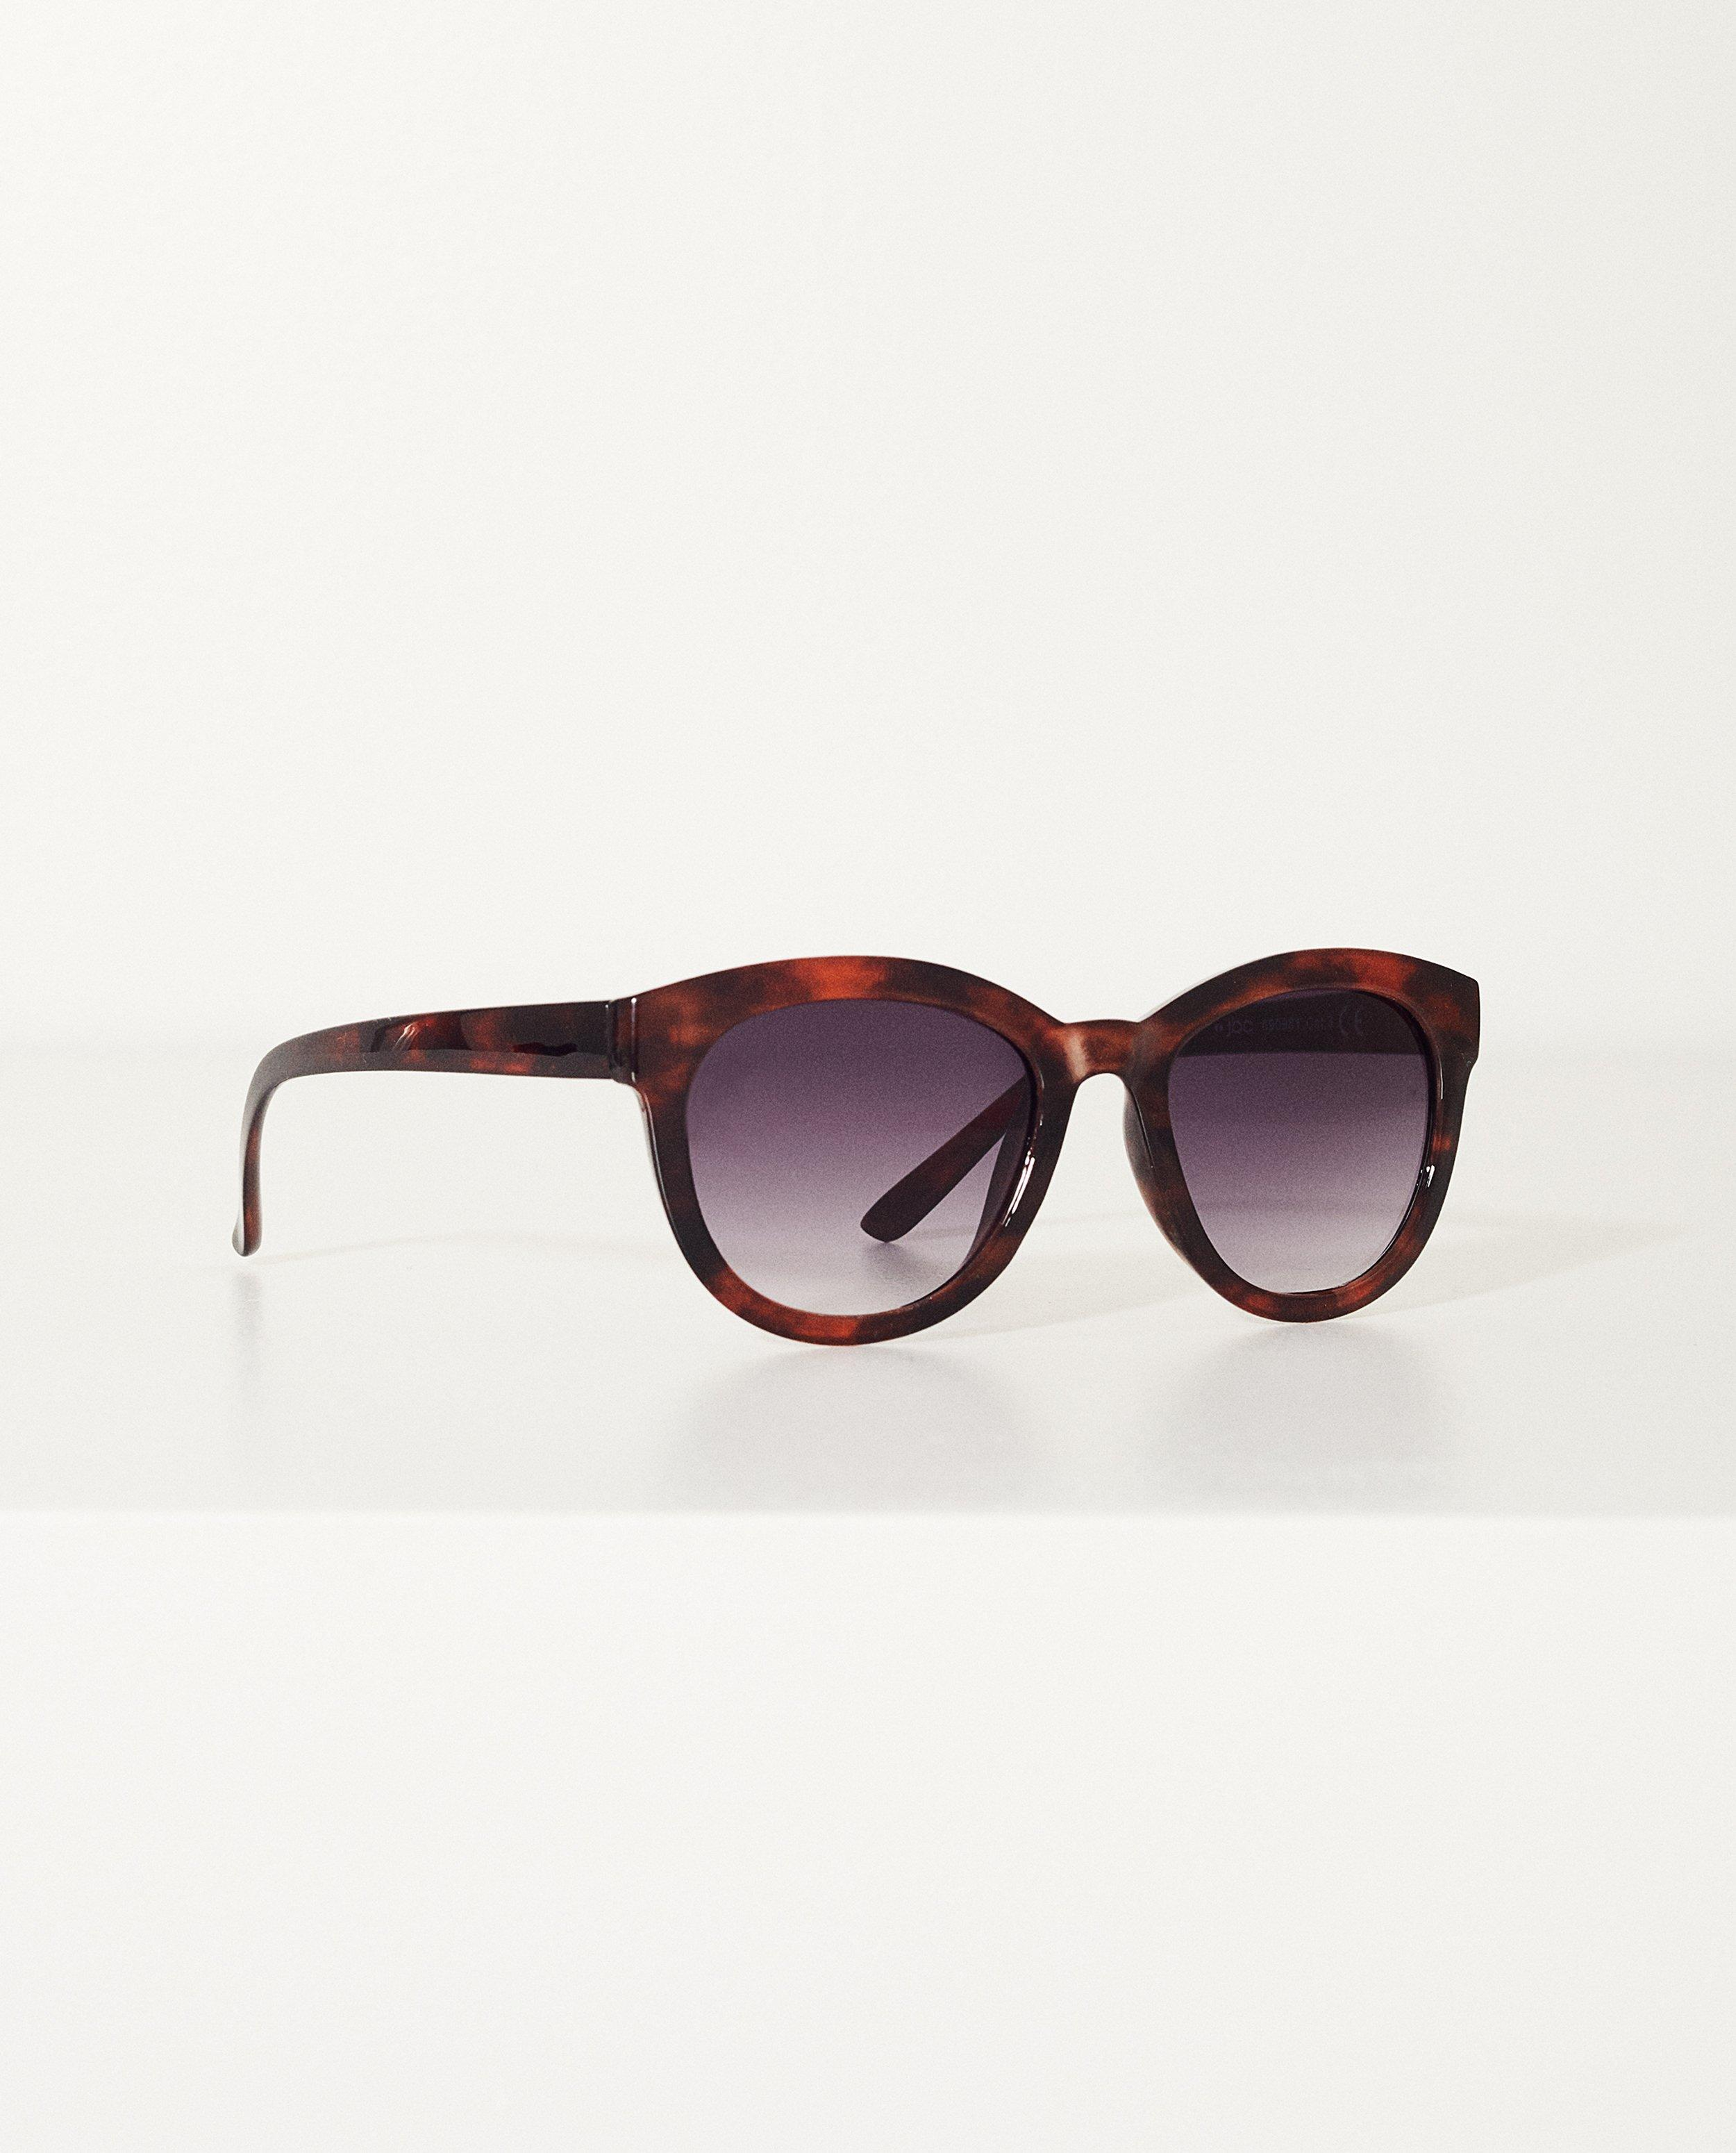 921039e1b3fb30 Bruine zonnebril met dierenprint Met print